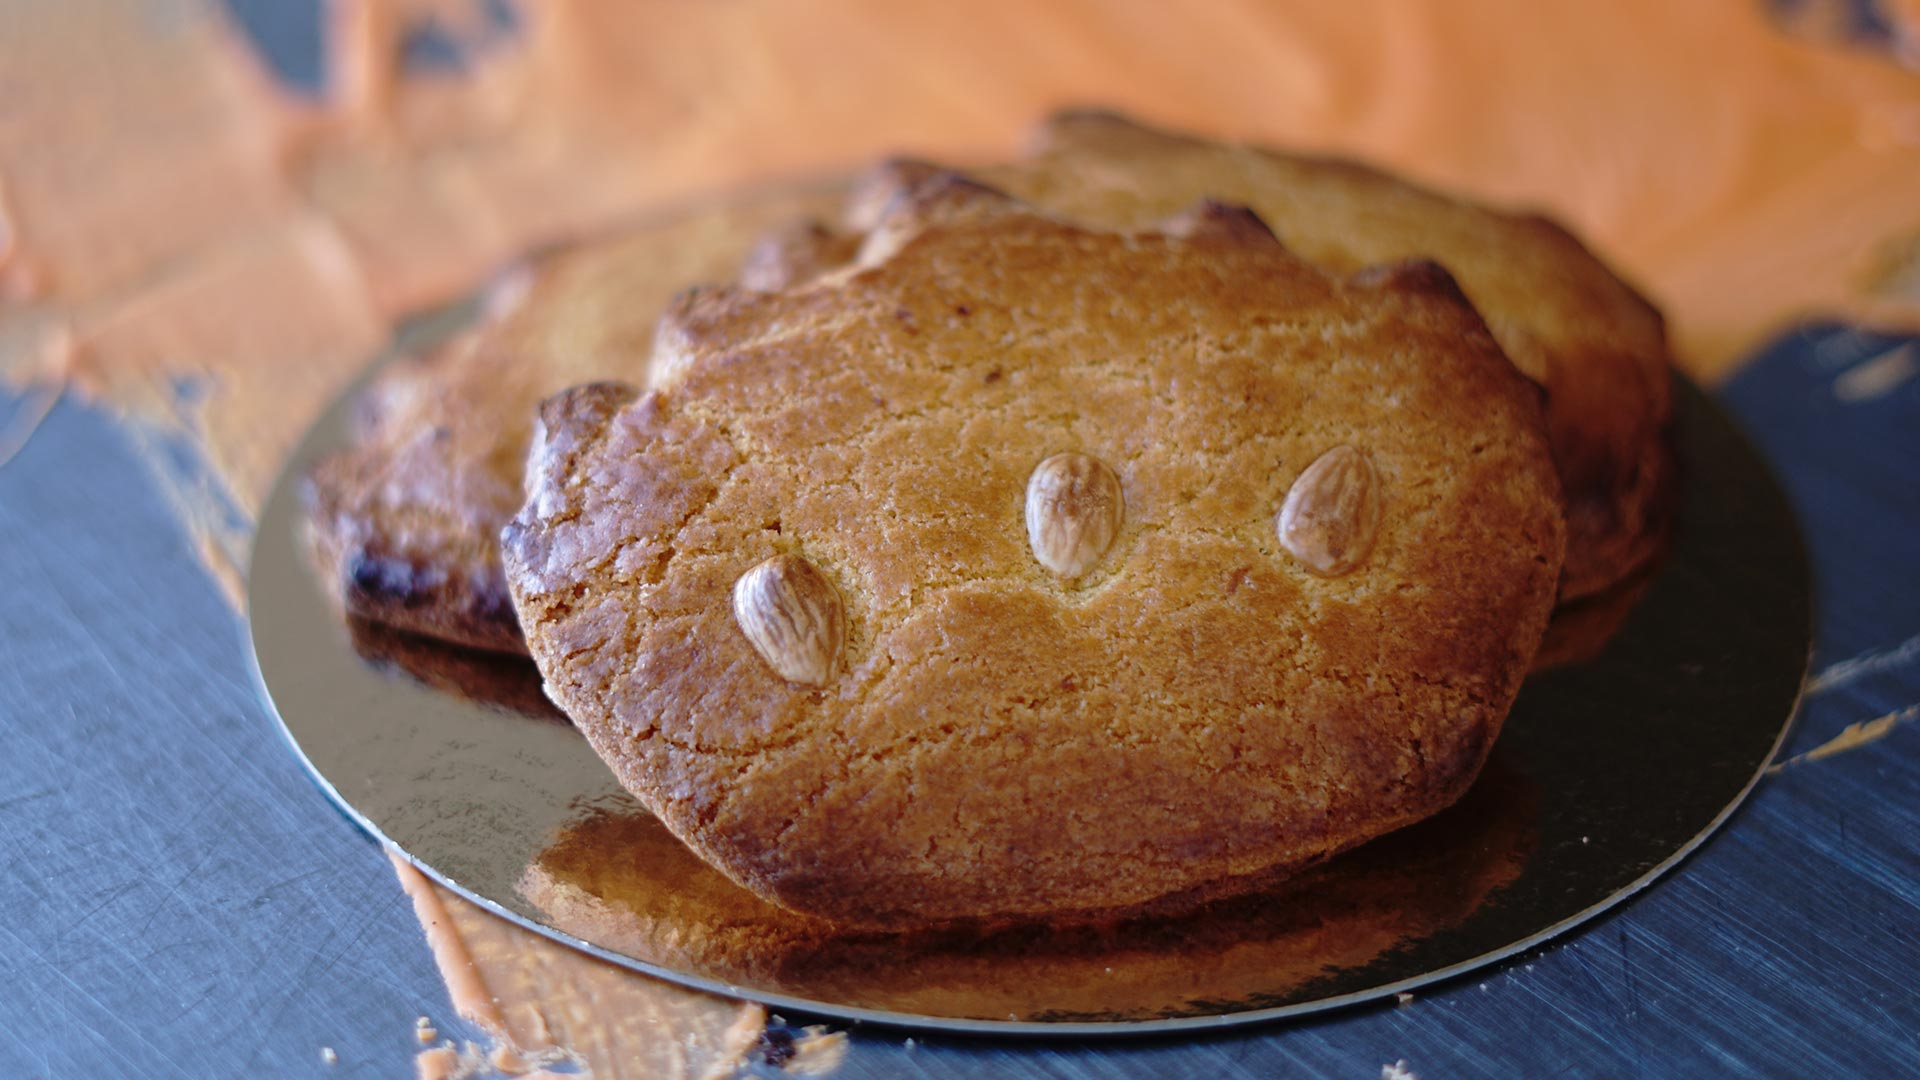 Fijne Koningsdag met Kroon gevulde koeken van Bakkerij Vooges